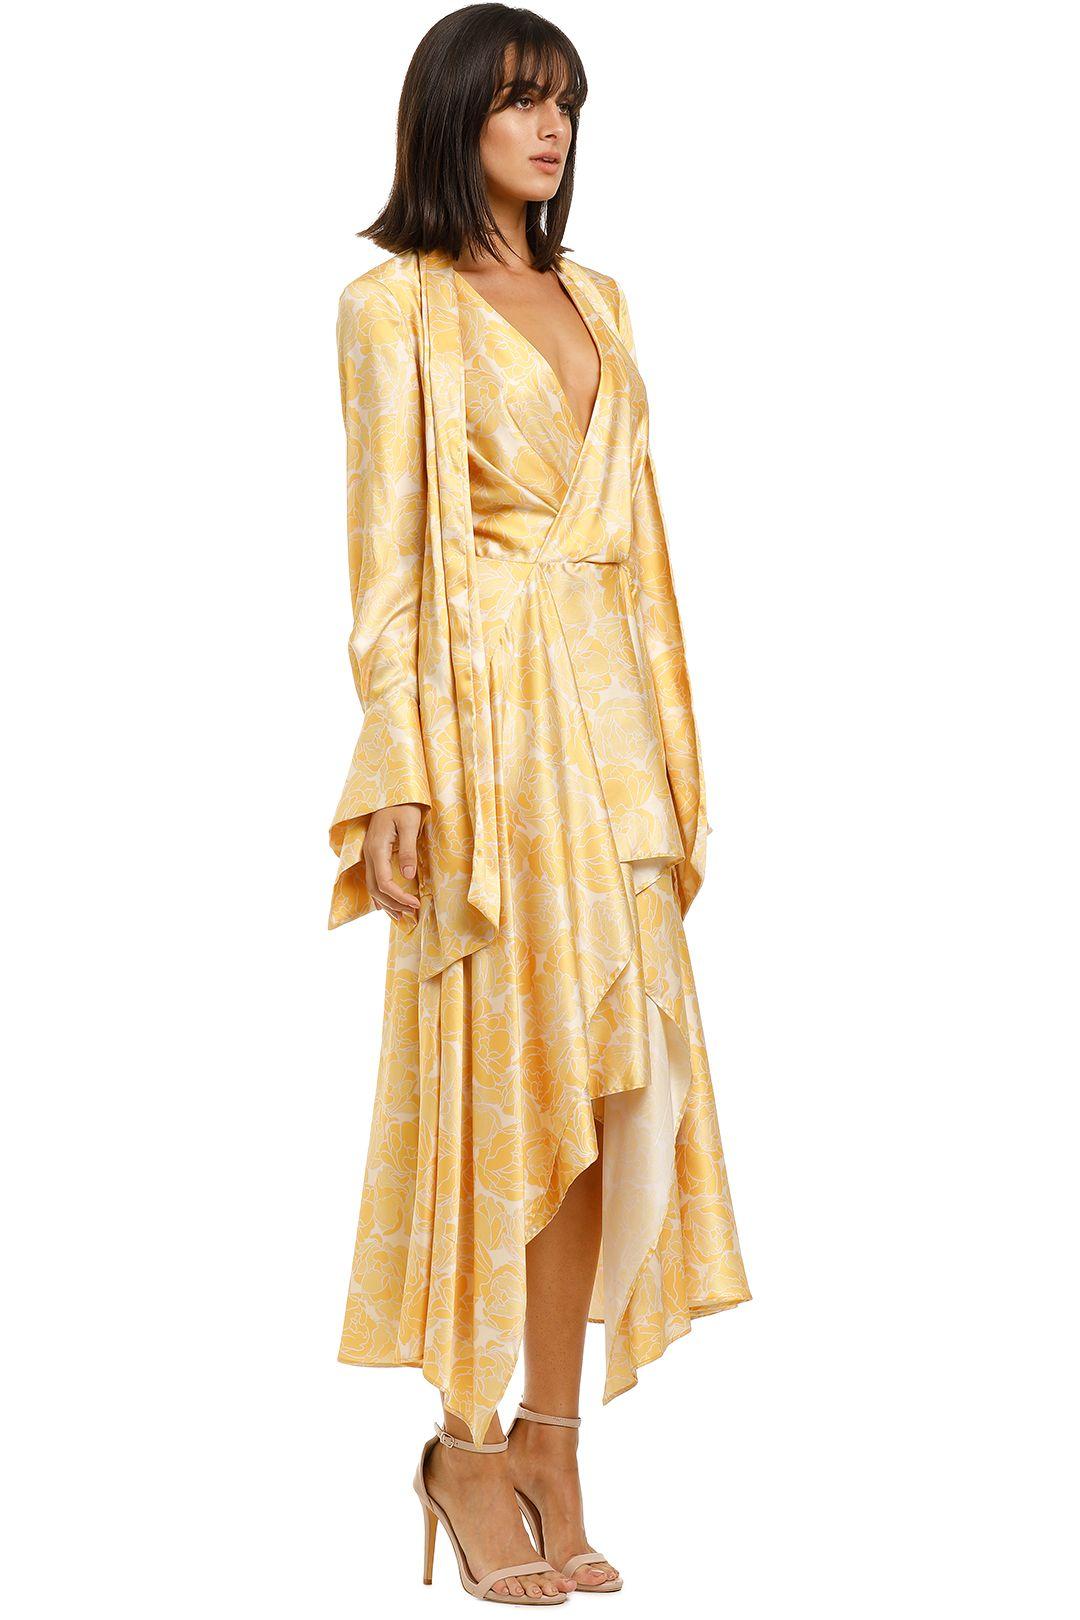 Acler-Wallace-Dress-Lemon-Floral-Side